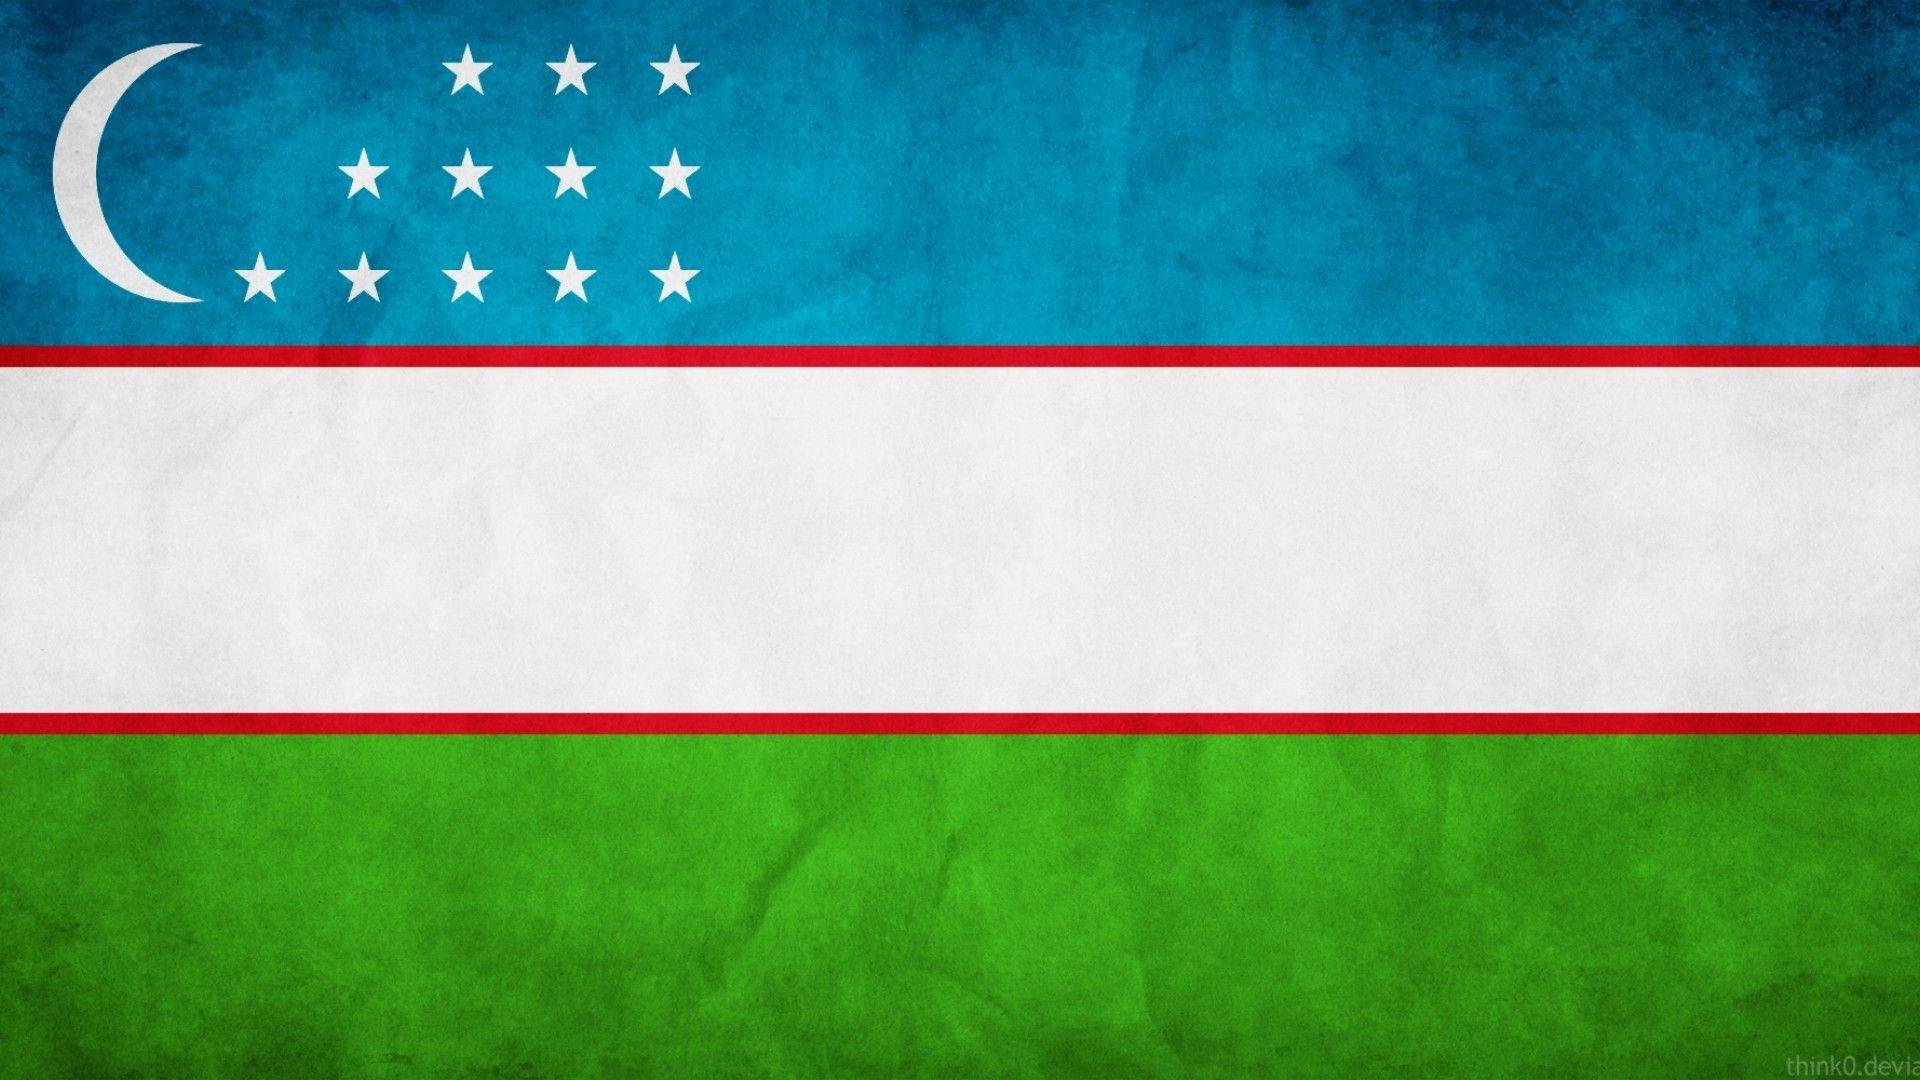 Flag of Uzbekistan wallpaper Education Flag Wallpaper Hd 1920x1080